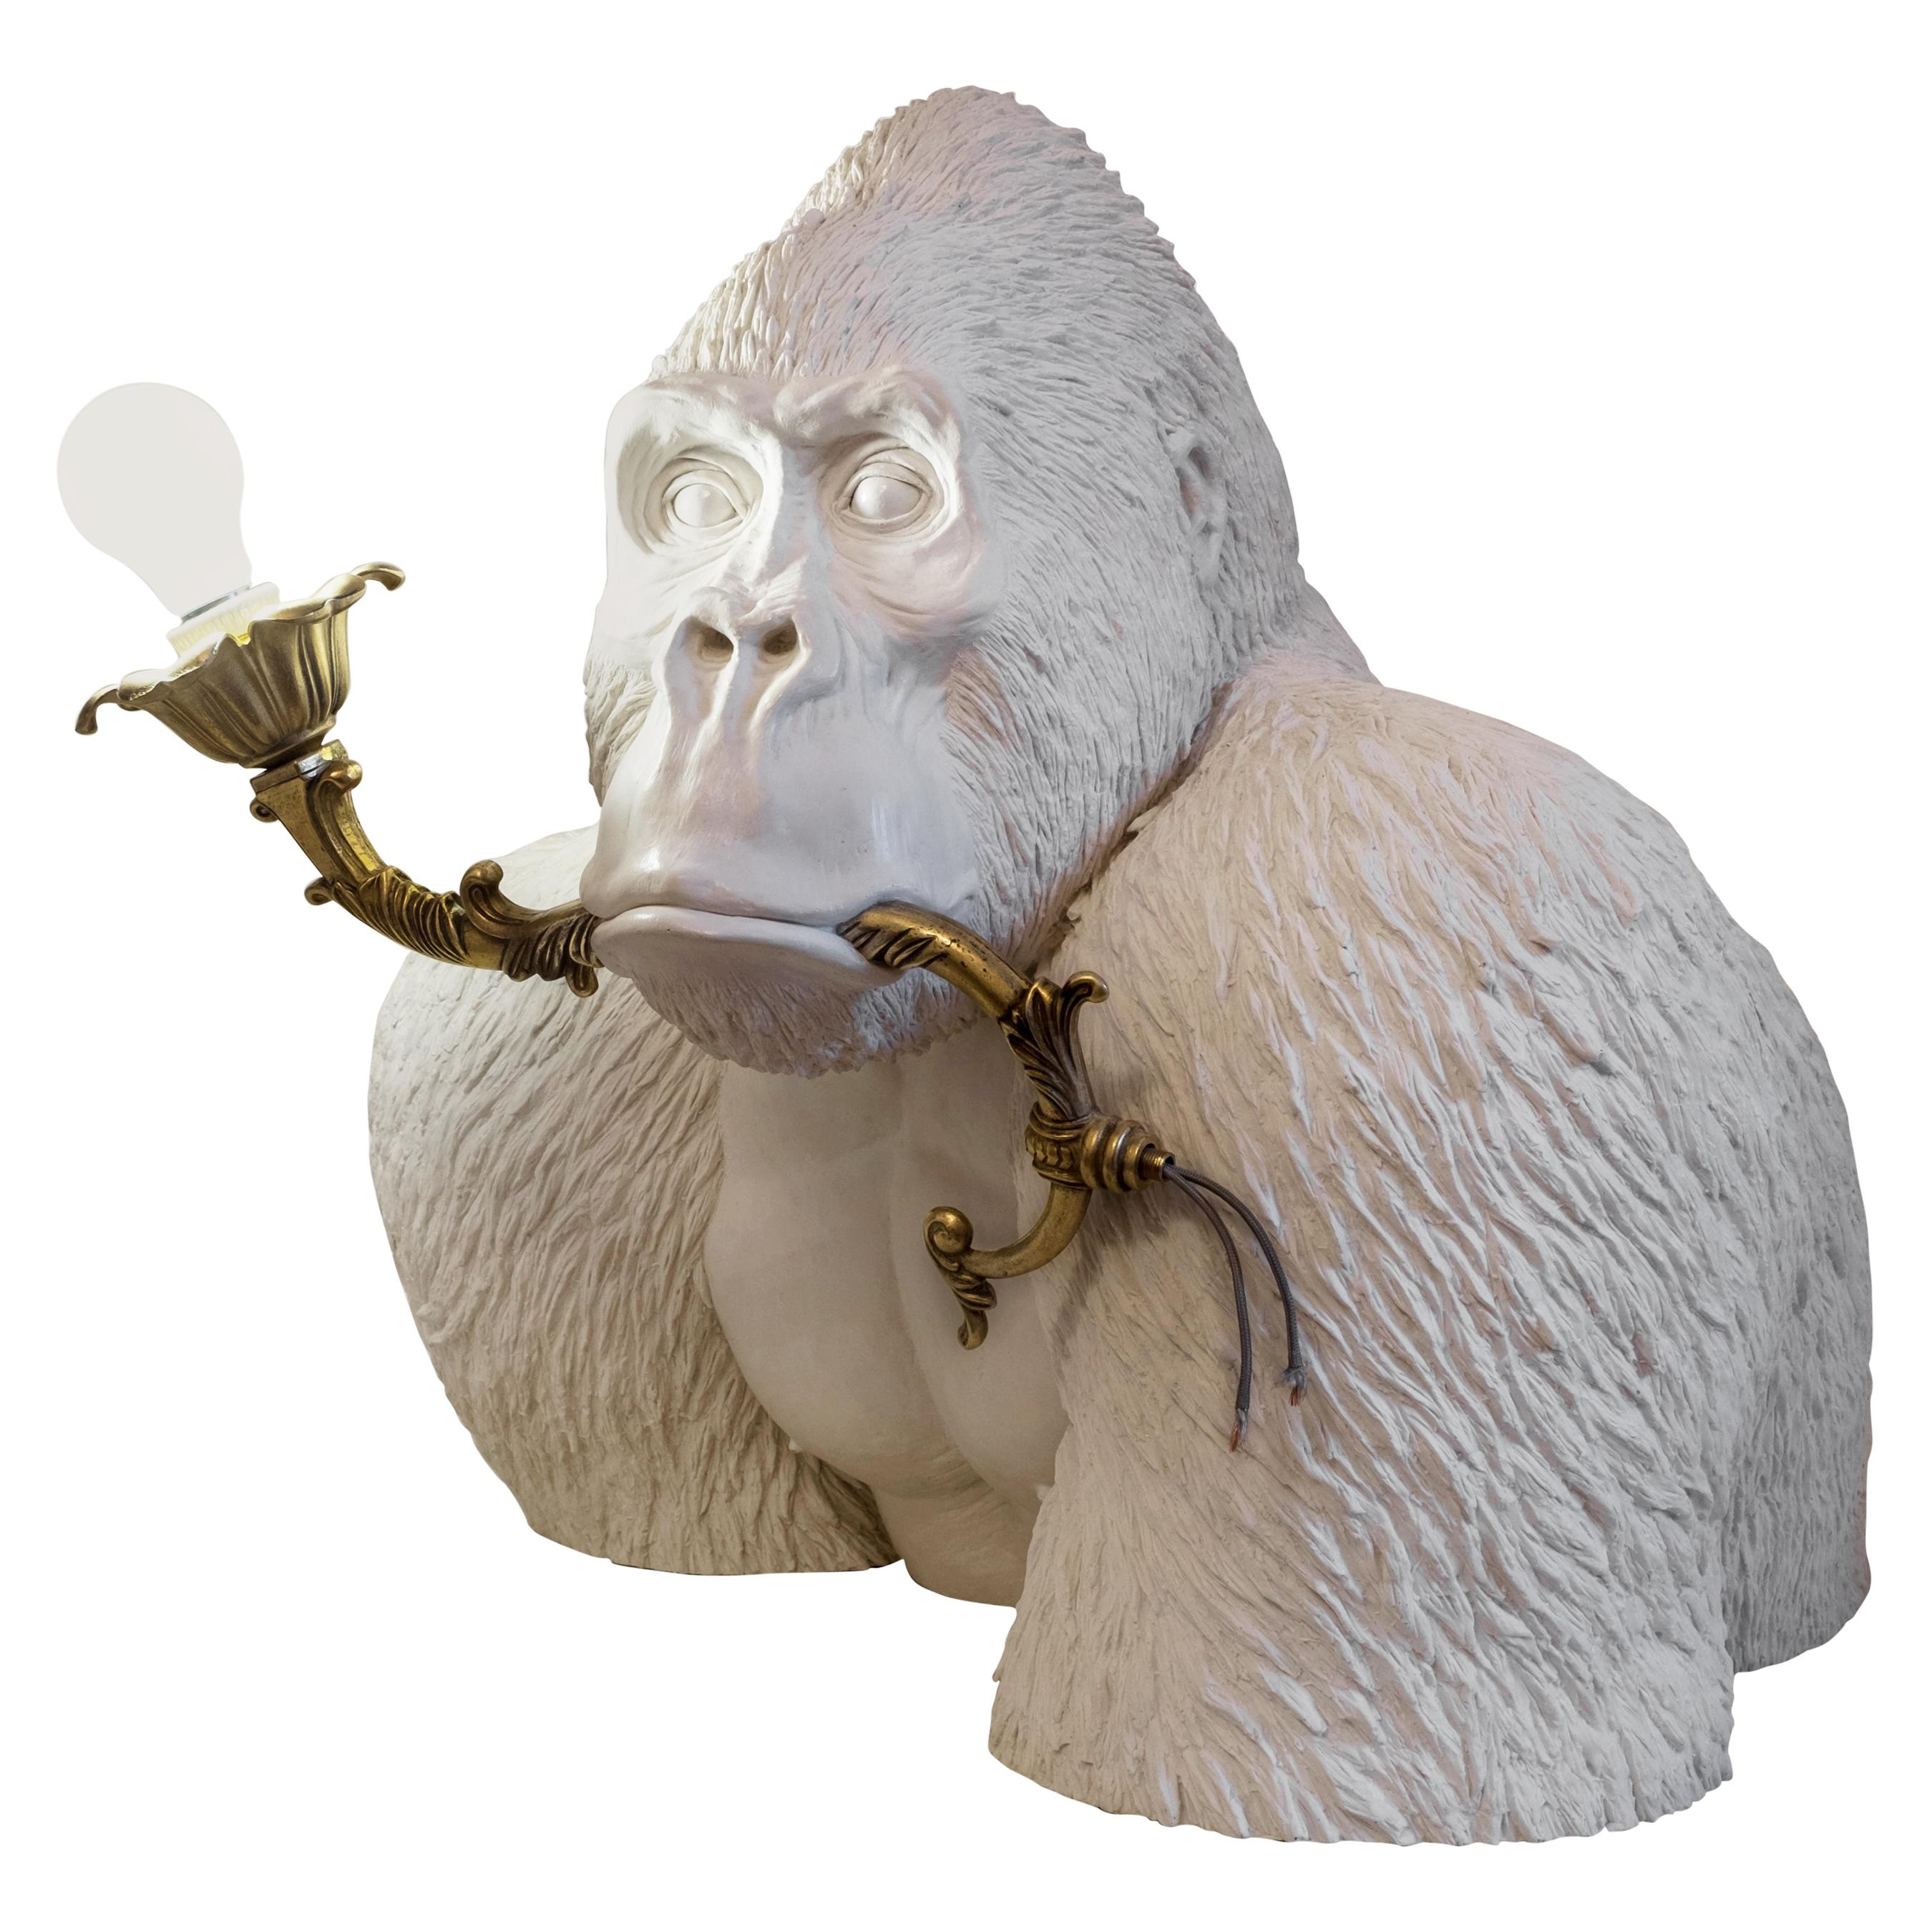 21st Century Gorilla Lamp Light by Marcantonio, White Painted Fiberglass Resin